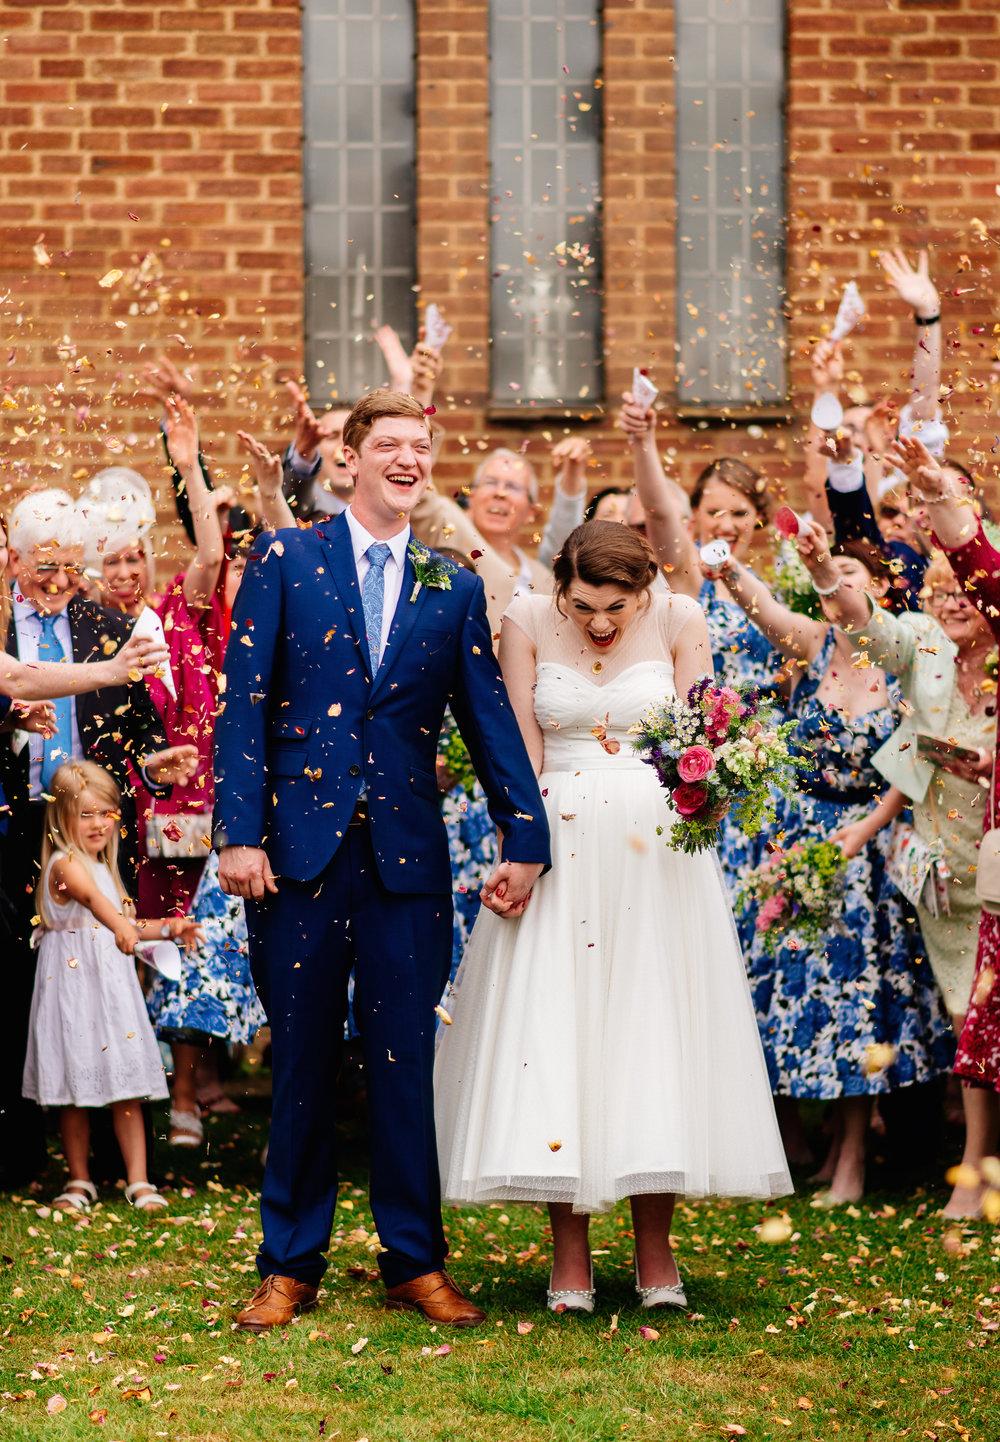 132 Emily + Daniel | Berkhamsted Towhall Wedding London Wedding Photographer Bride Groom Watford.jpg